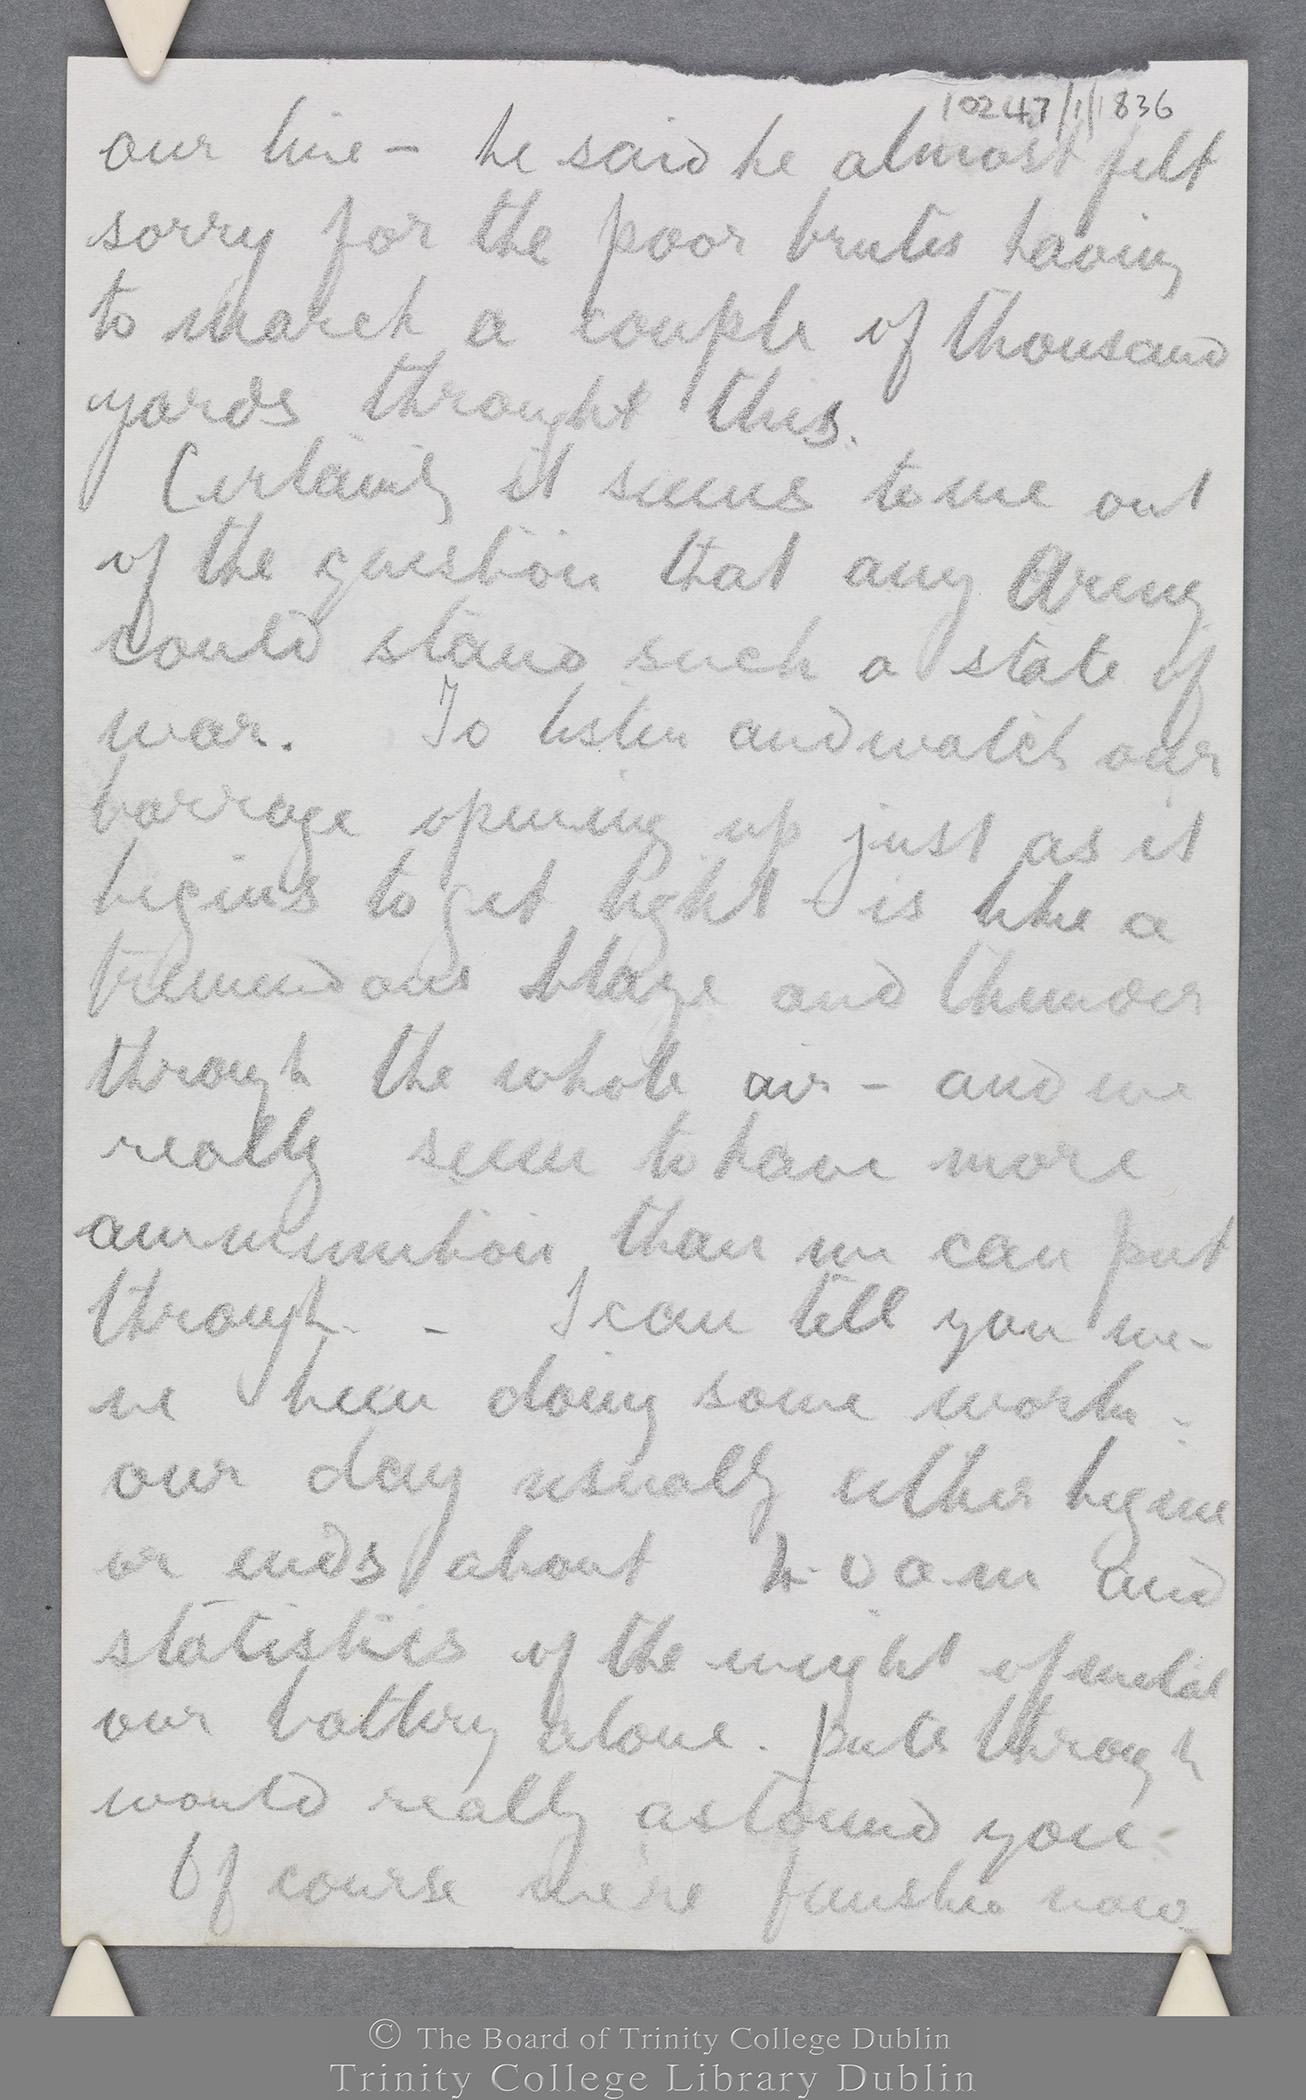 TCD MS 10247/1/836 folio 5 recto